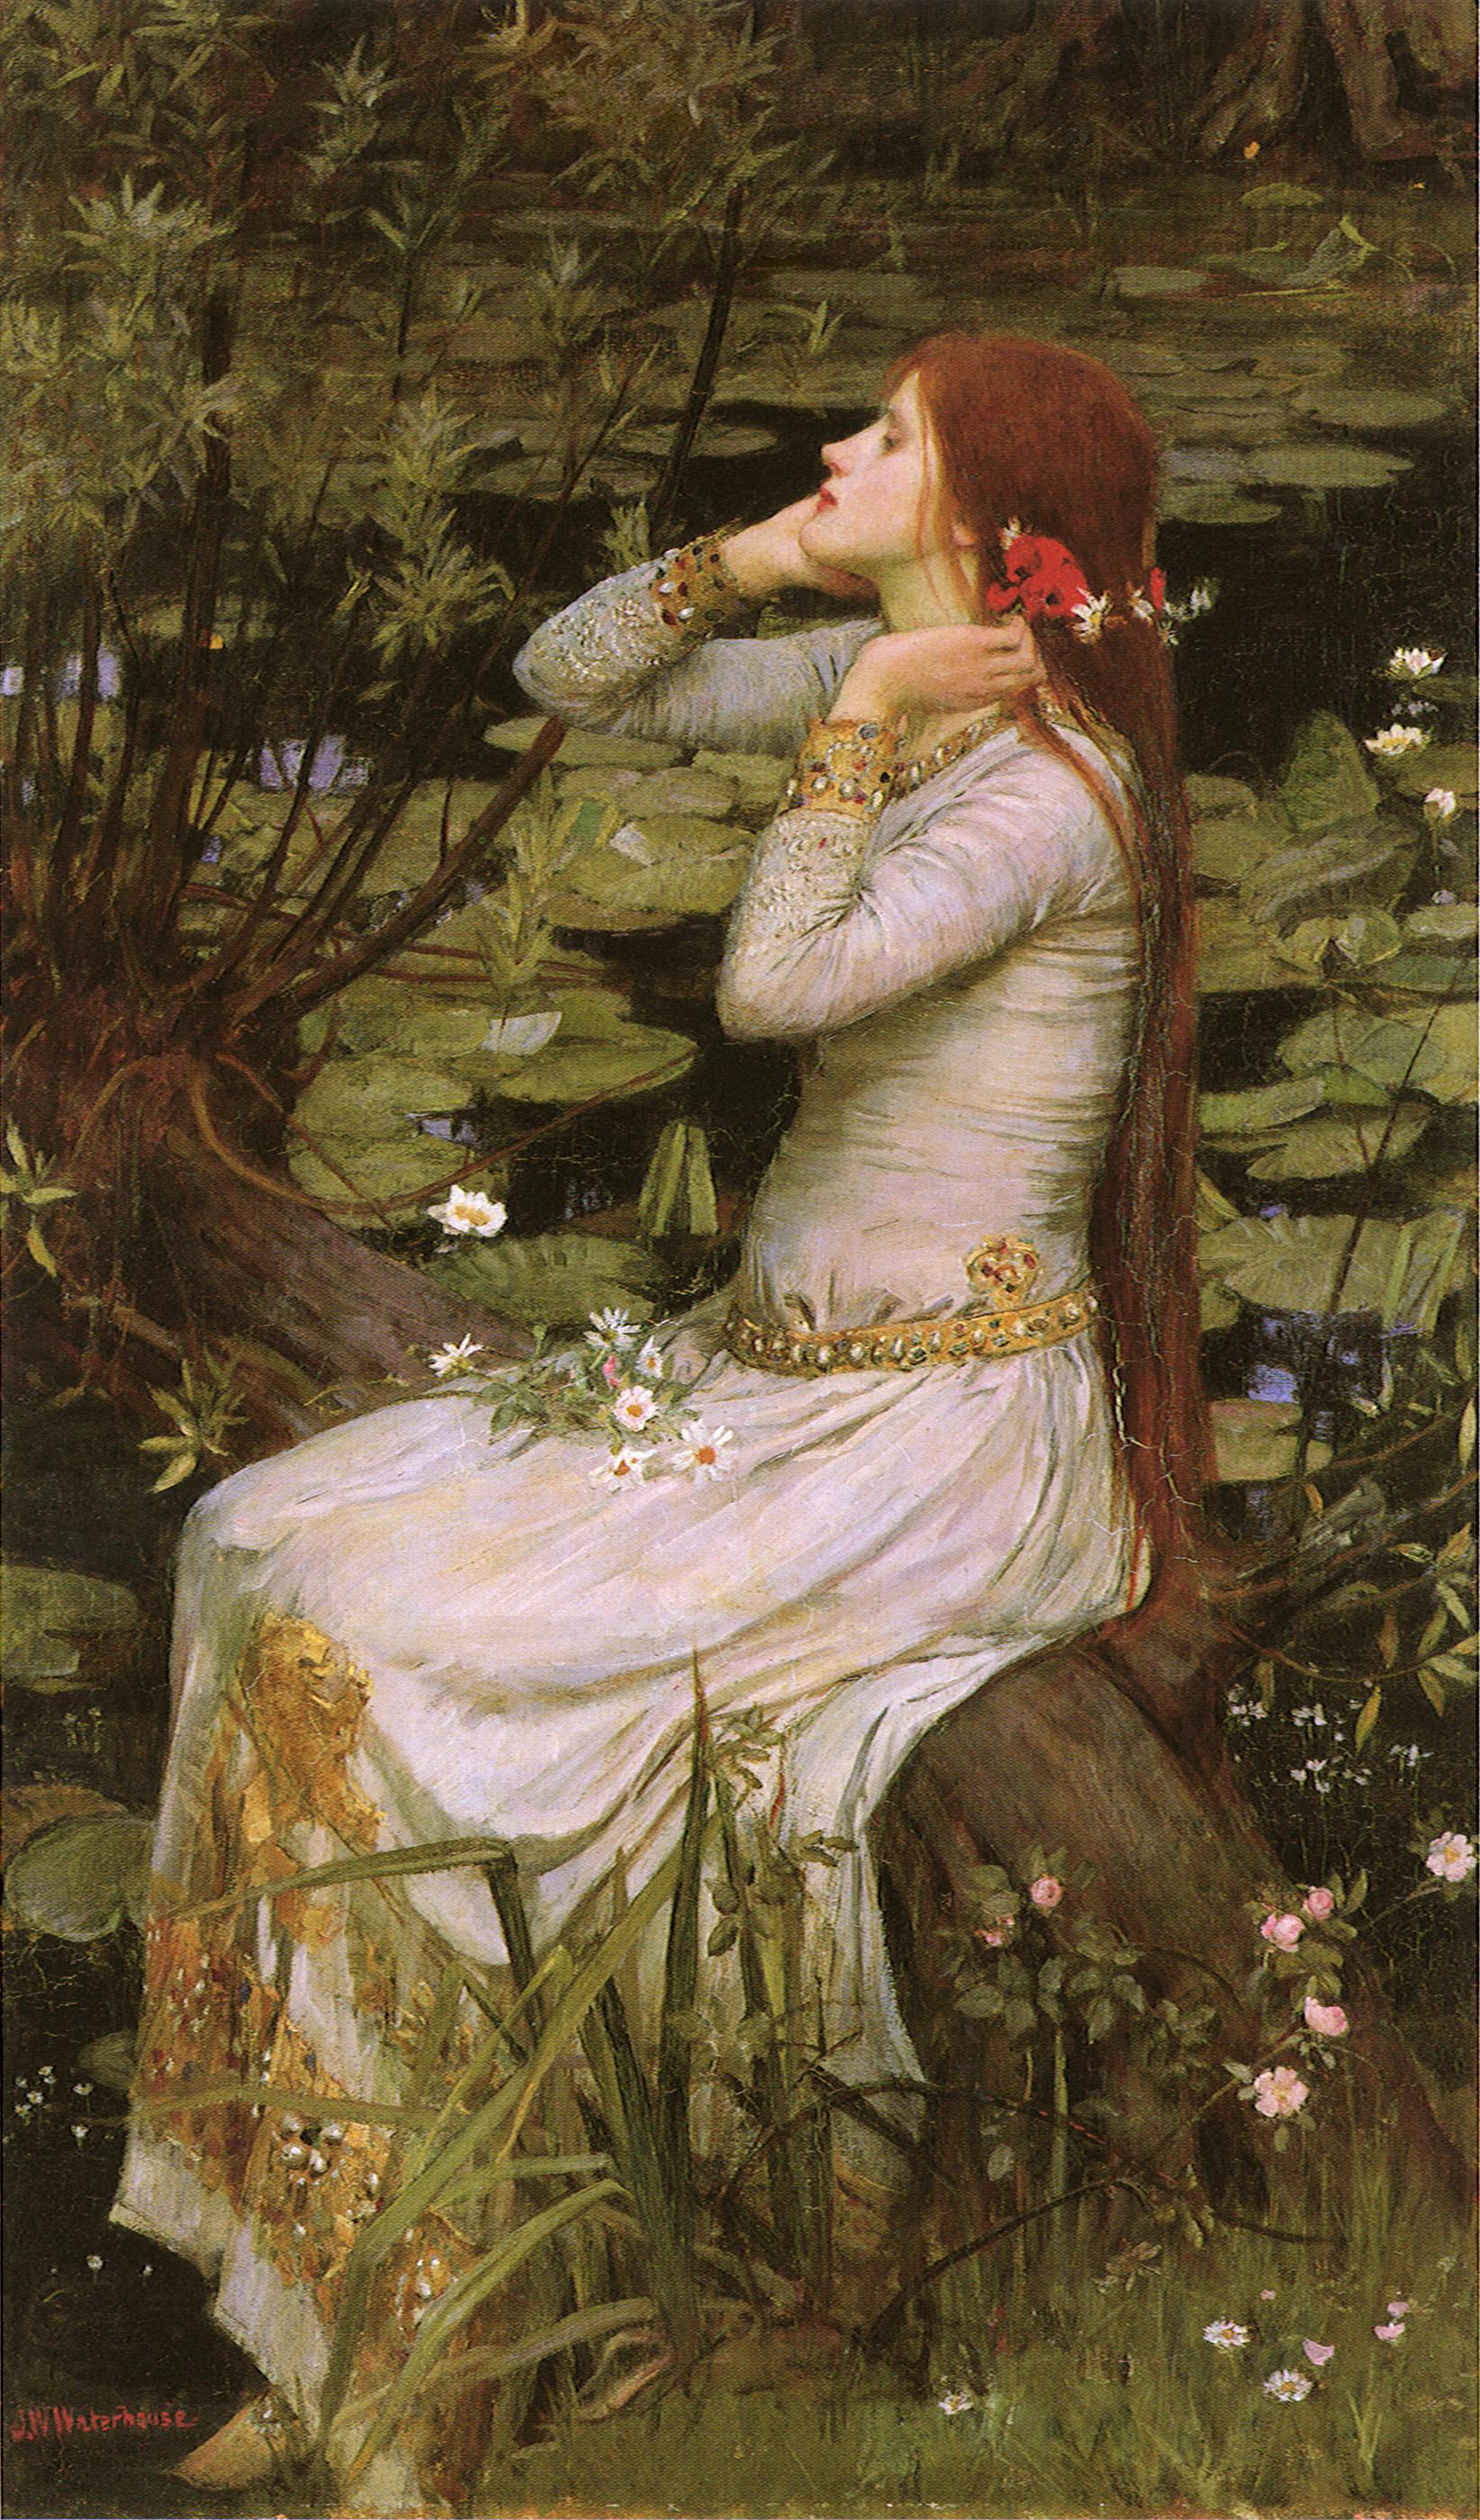 12. John William Waterhouse, Ofelia, 1894